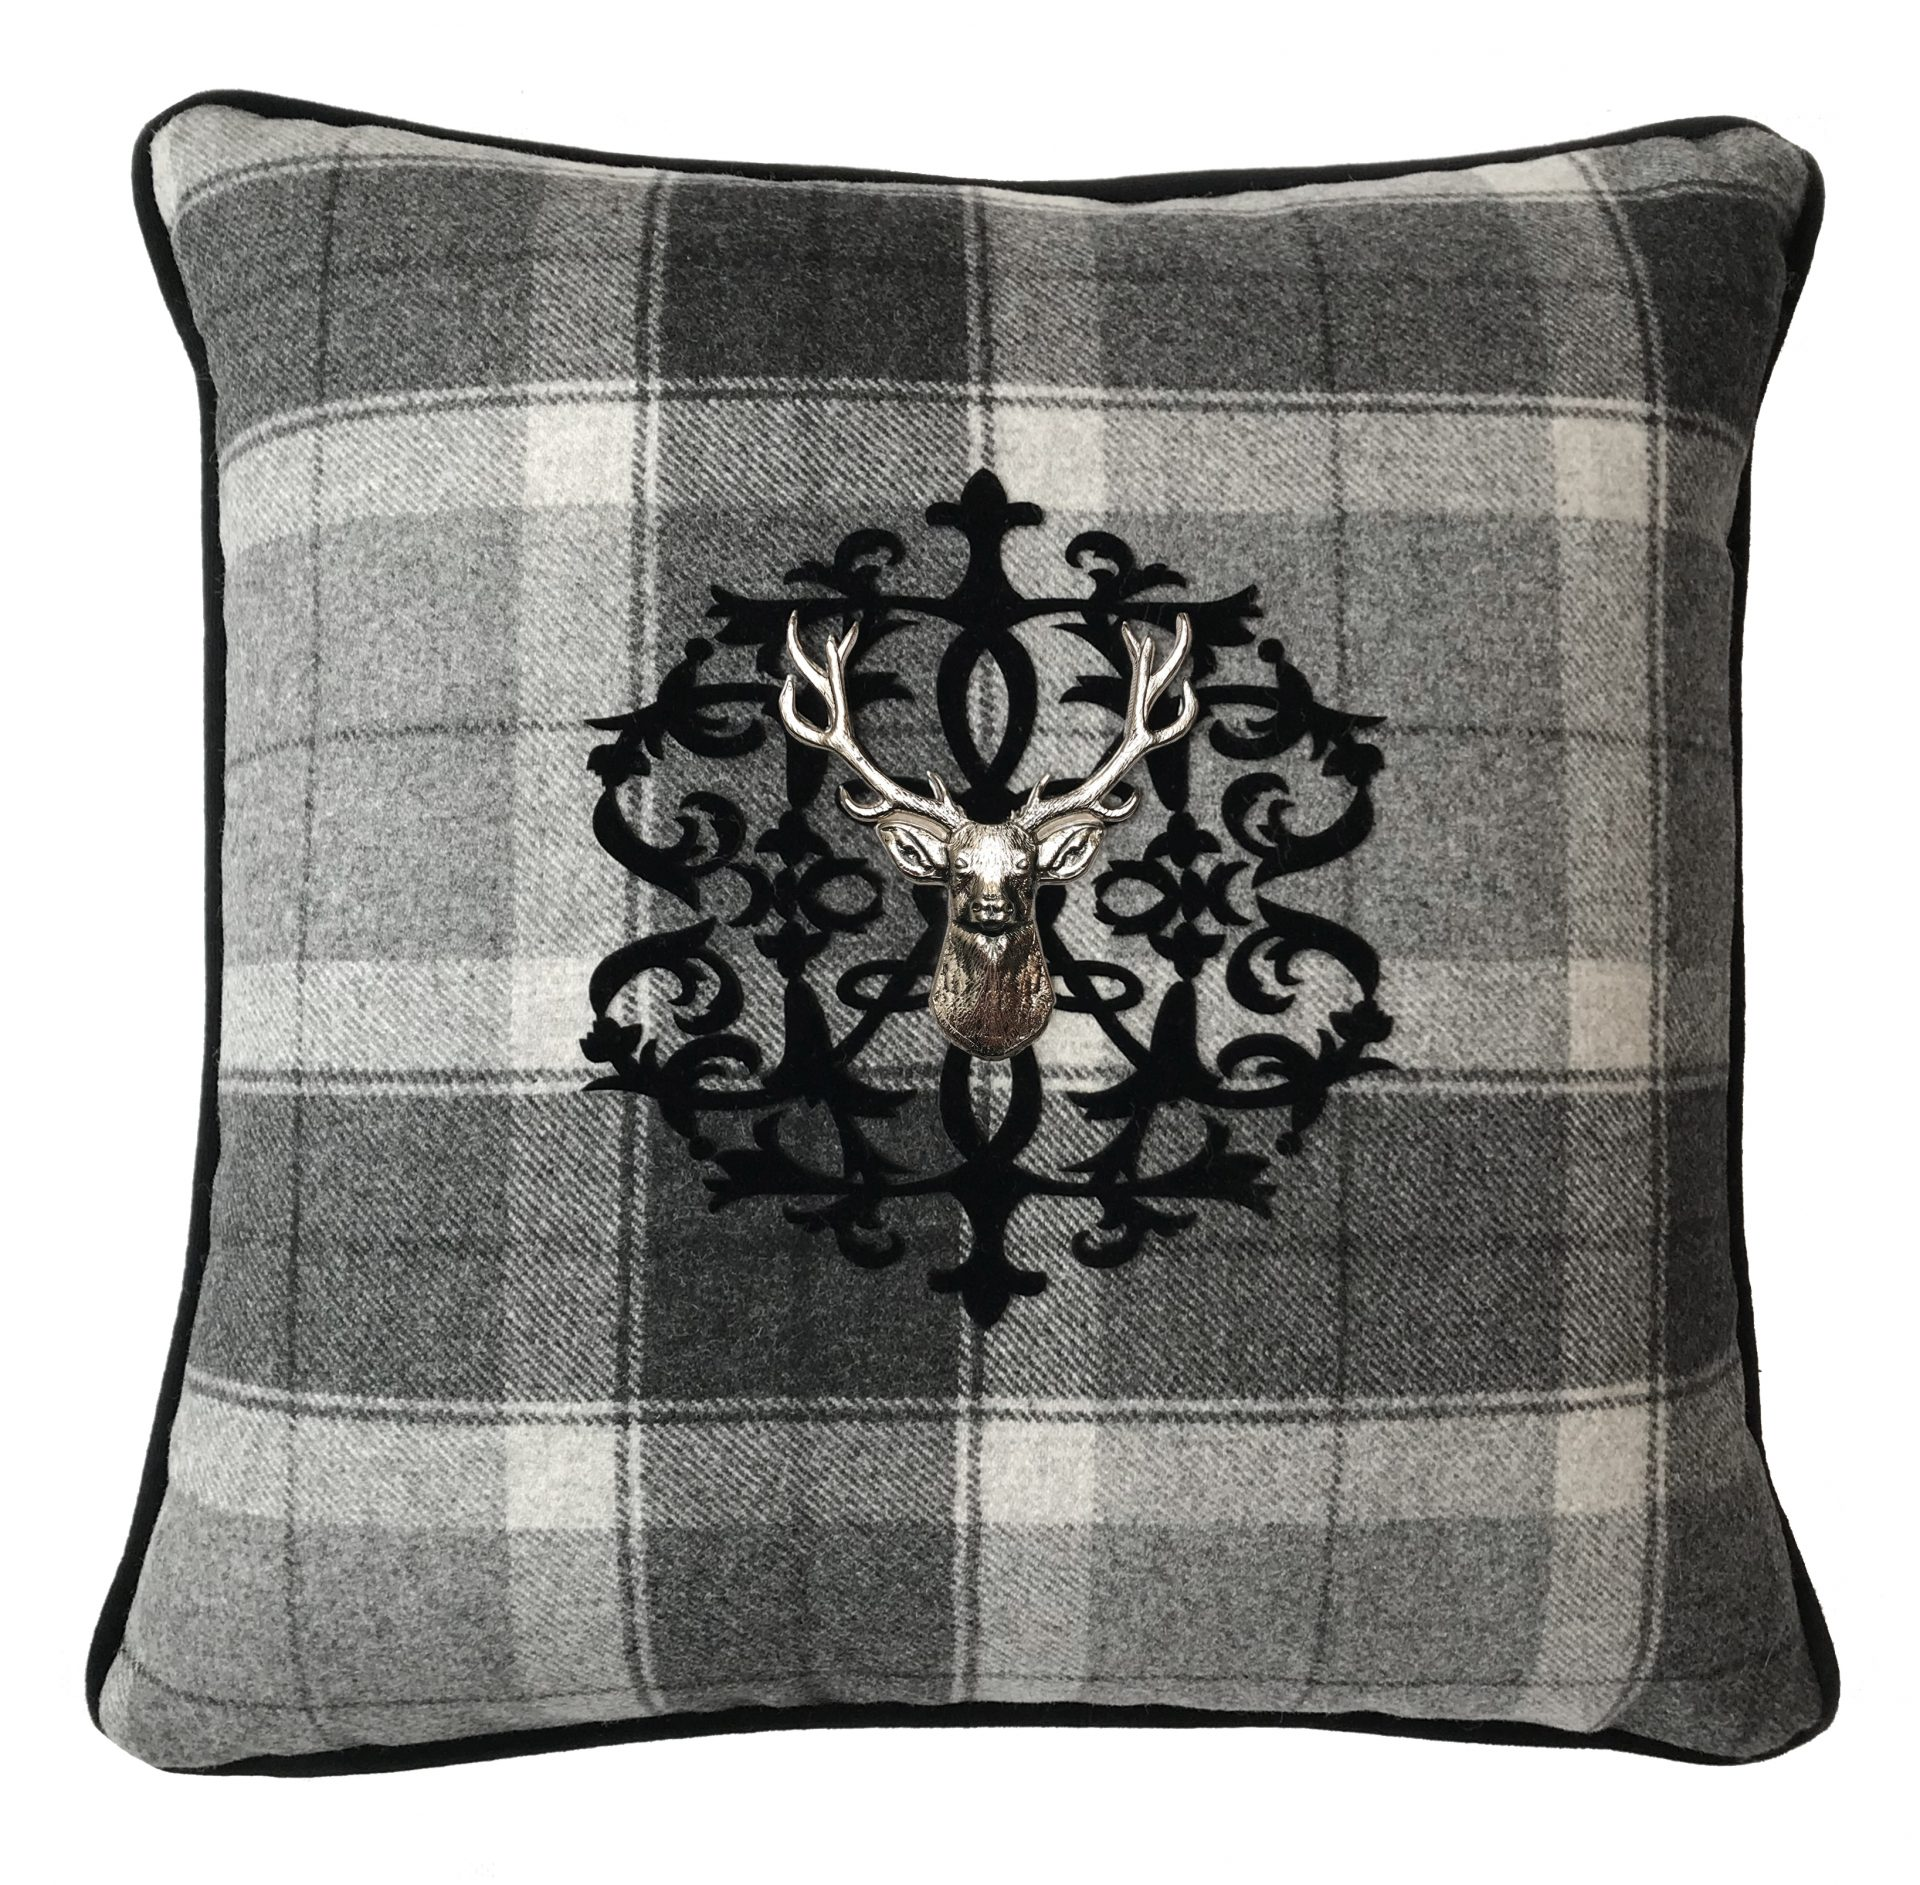 Tartan Throw Pillow With Velvet Applique Monogram And Silver Stag